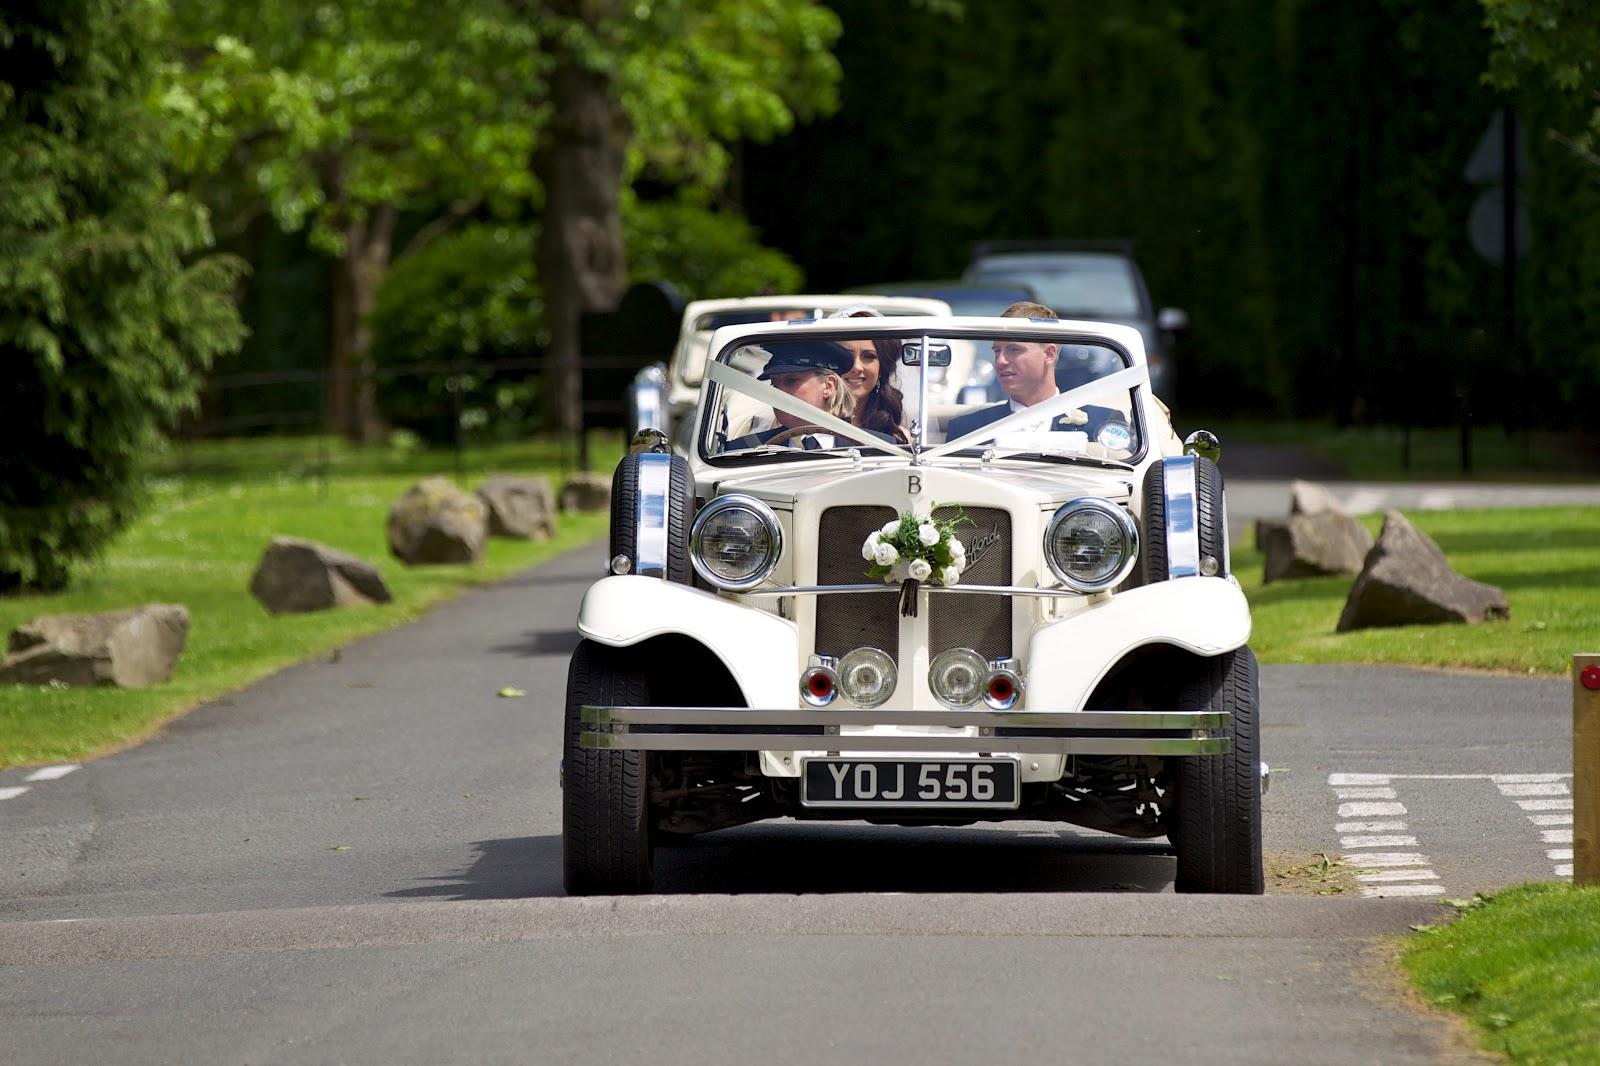 Englands Finest Wedding Cars Bristol: September 2012